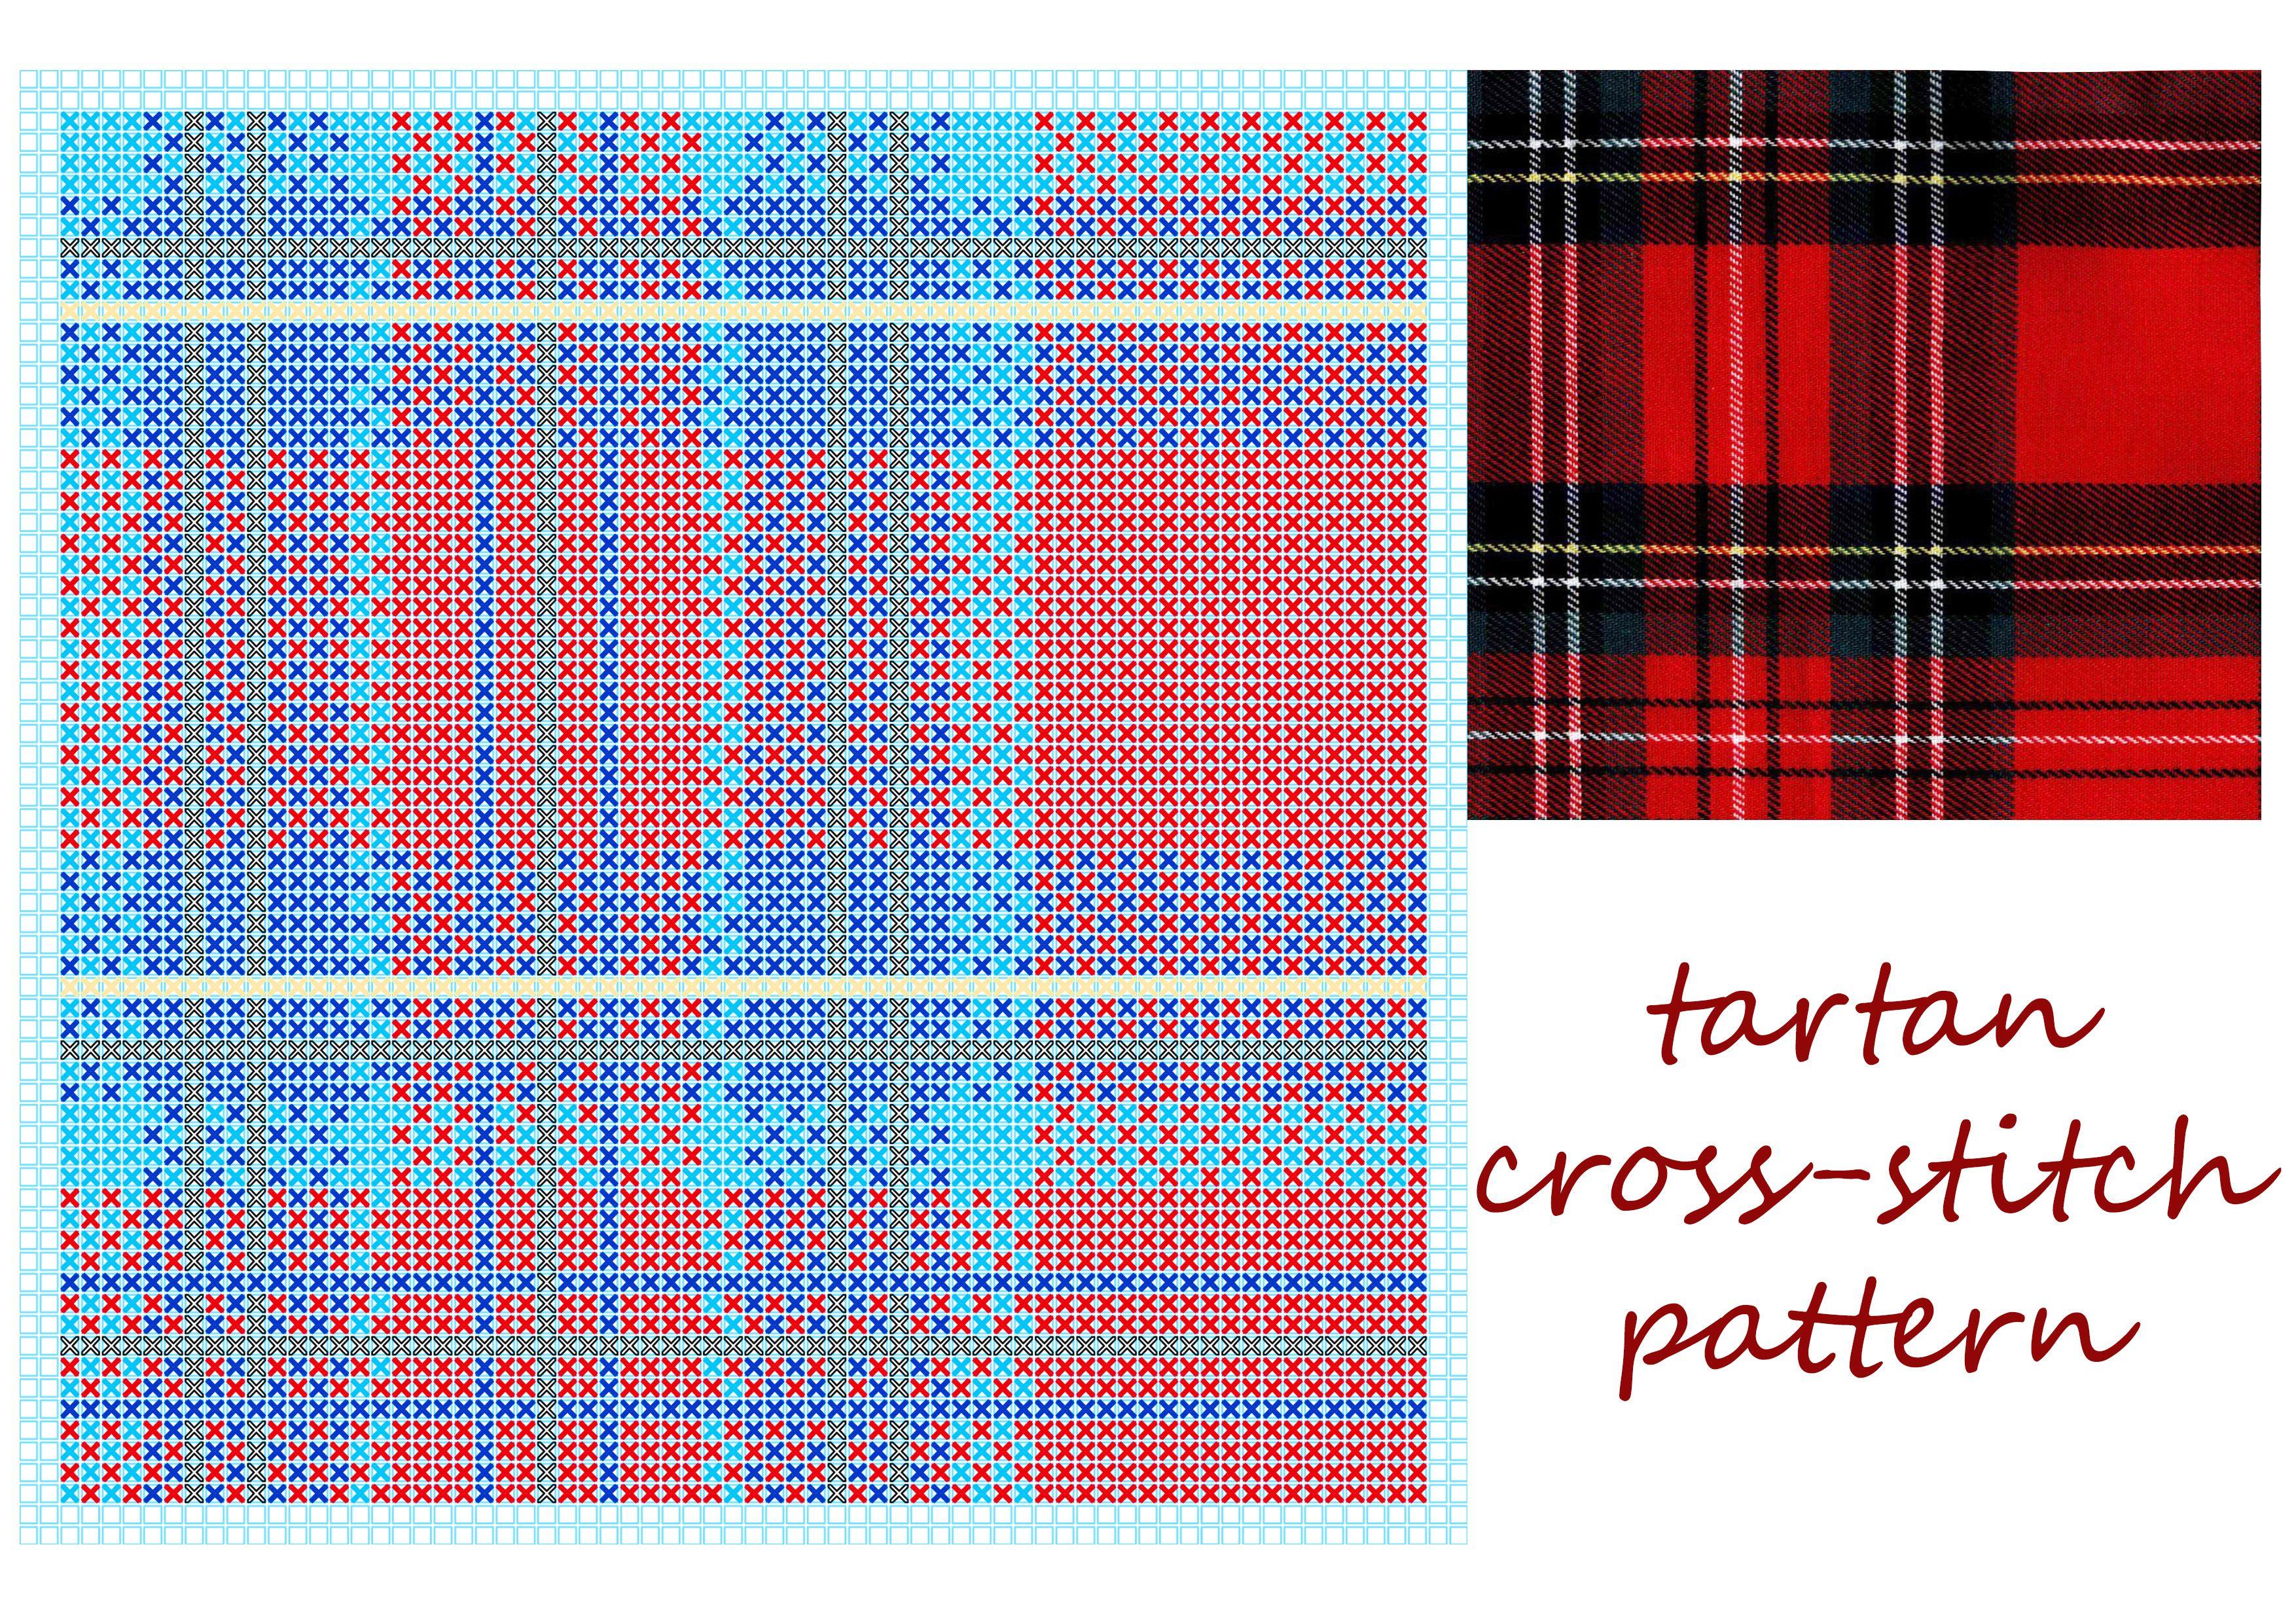 Free Tartan Plaid Cross Stitch Pattern Stitching Pinterest